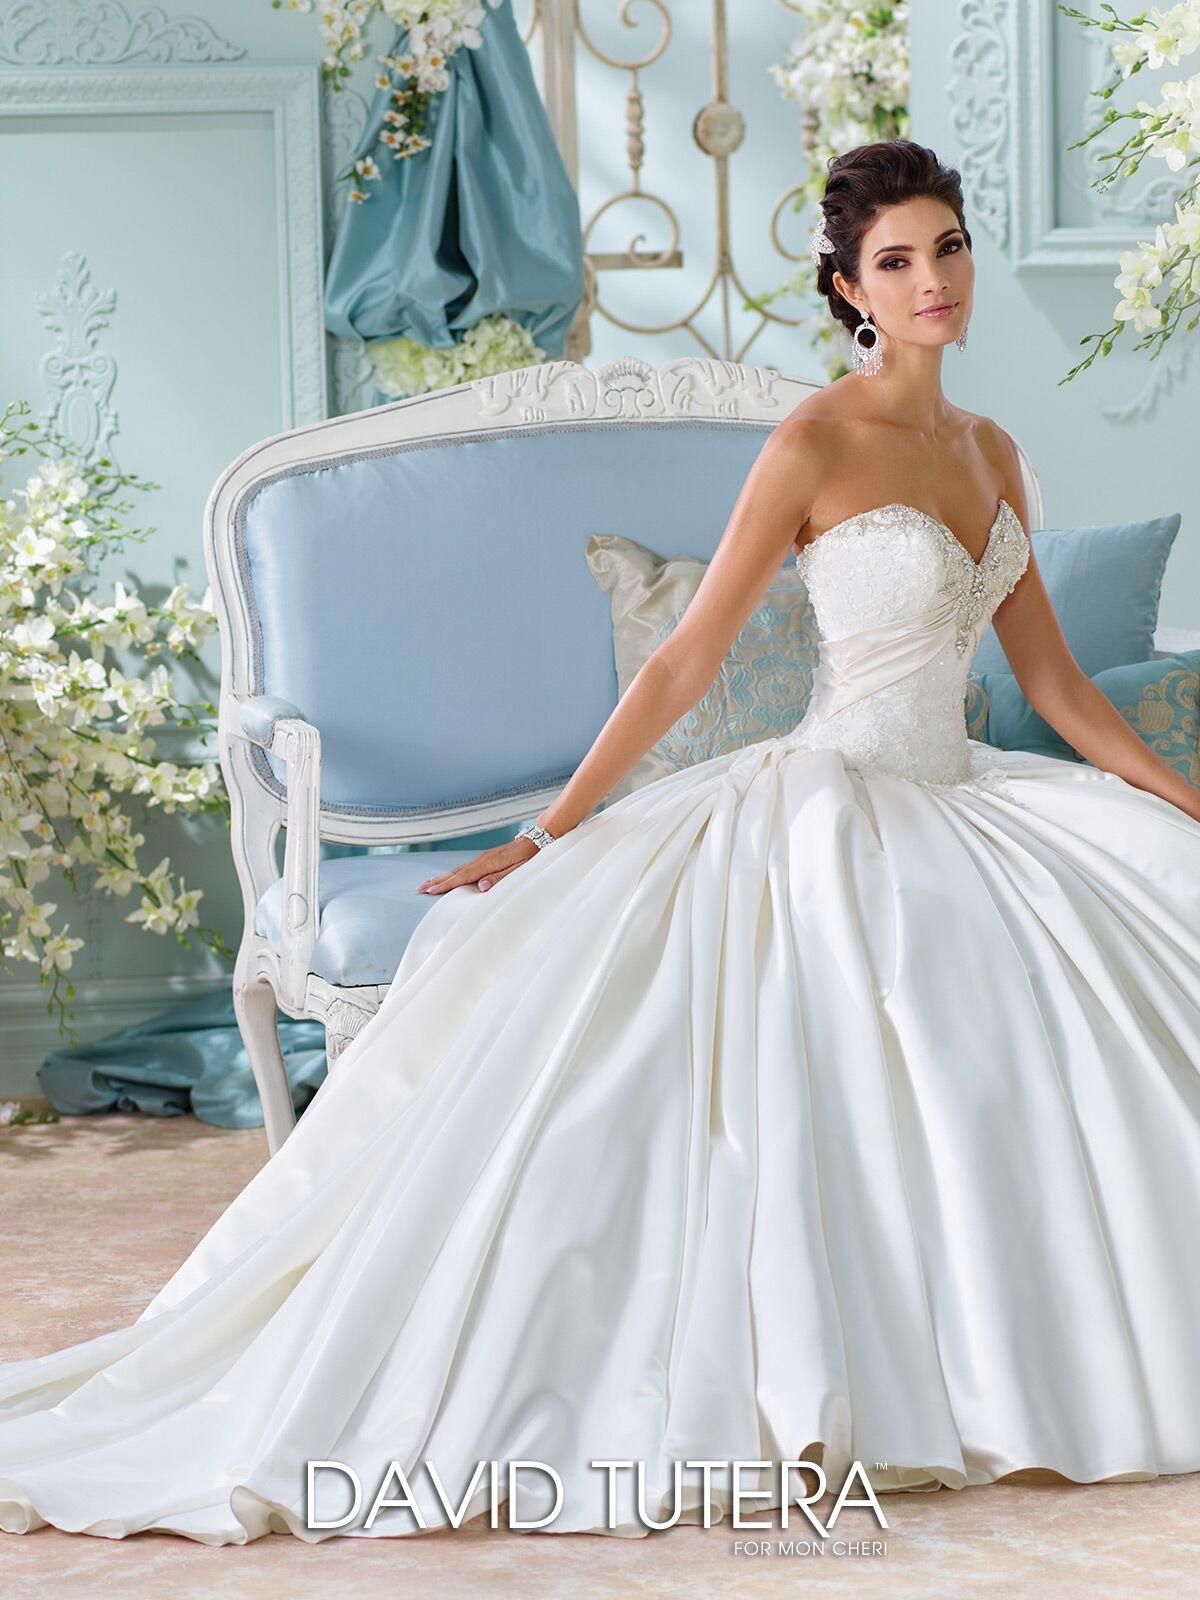 The Perfect Dress - Princeton, NJ